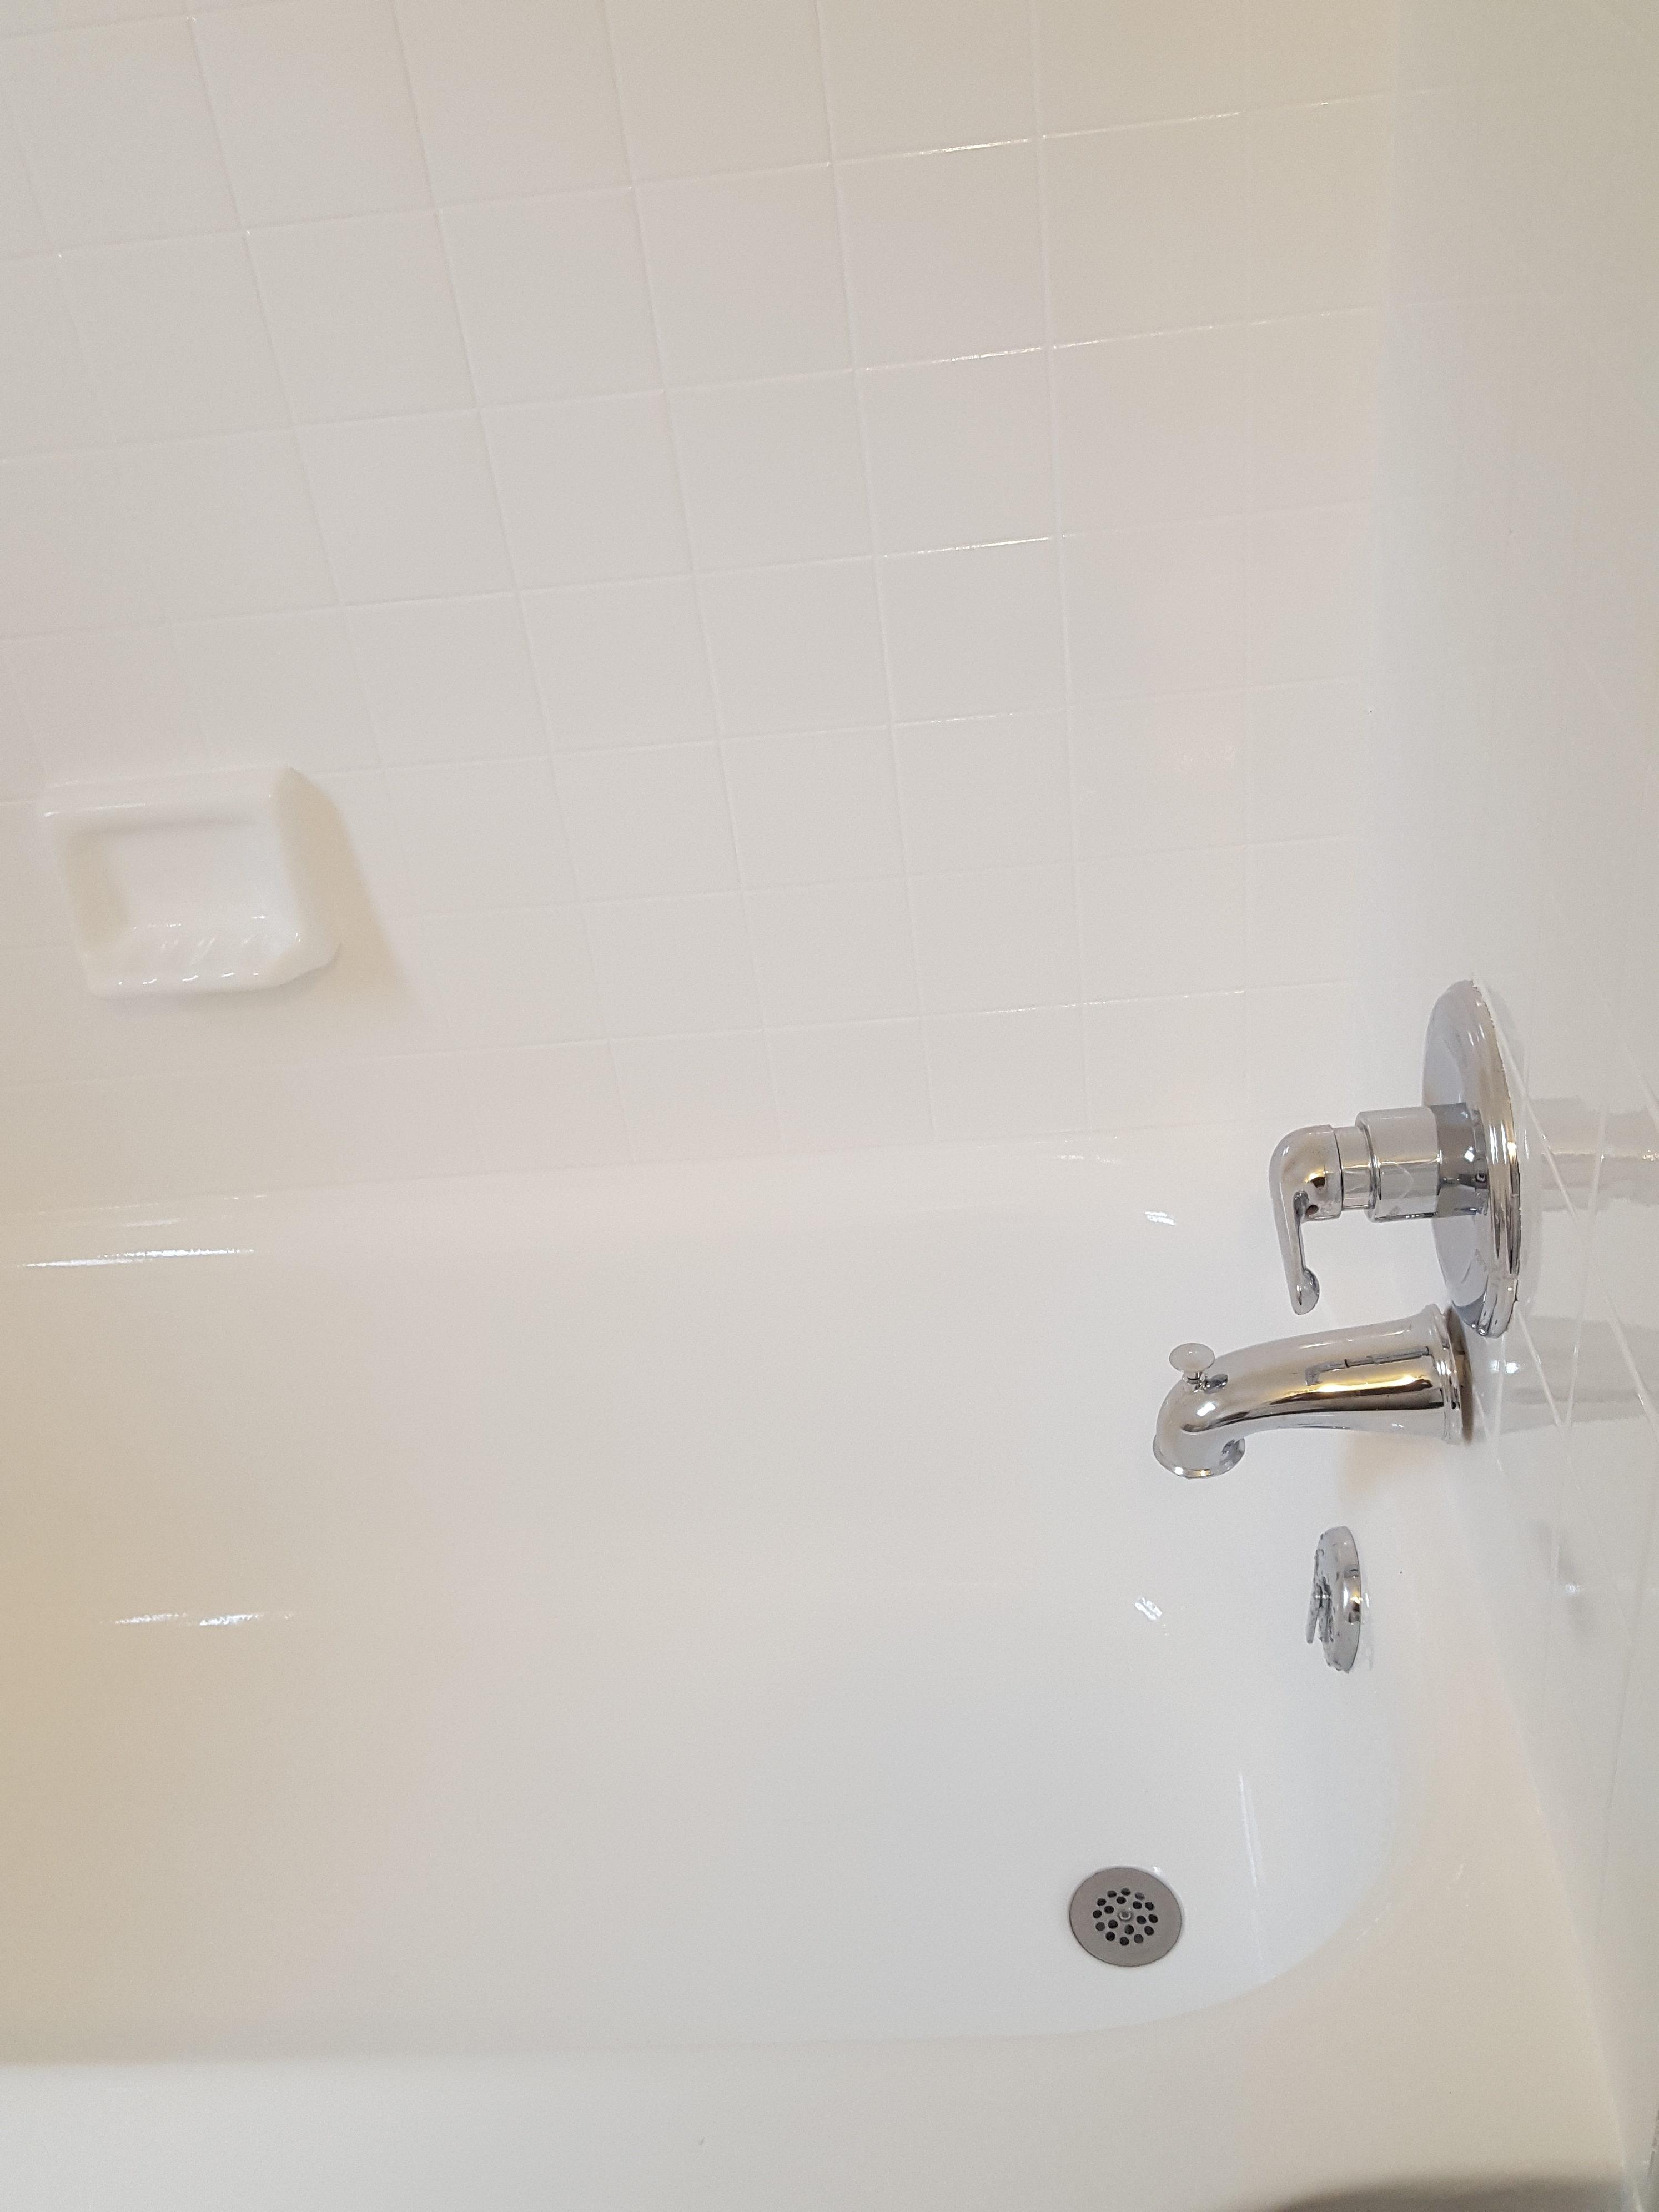 http://www.bathtubdoctor.com/wp-content/uploads/2017/03/20160429_101324-e1488683860236.jpg